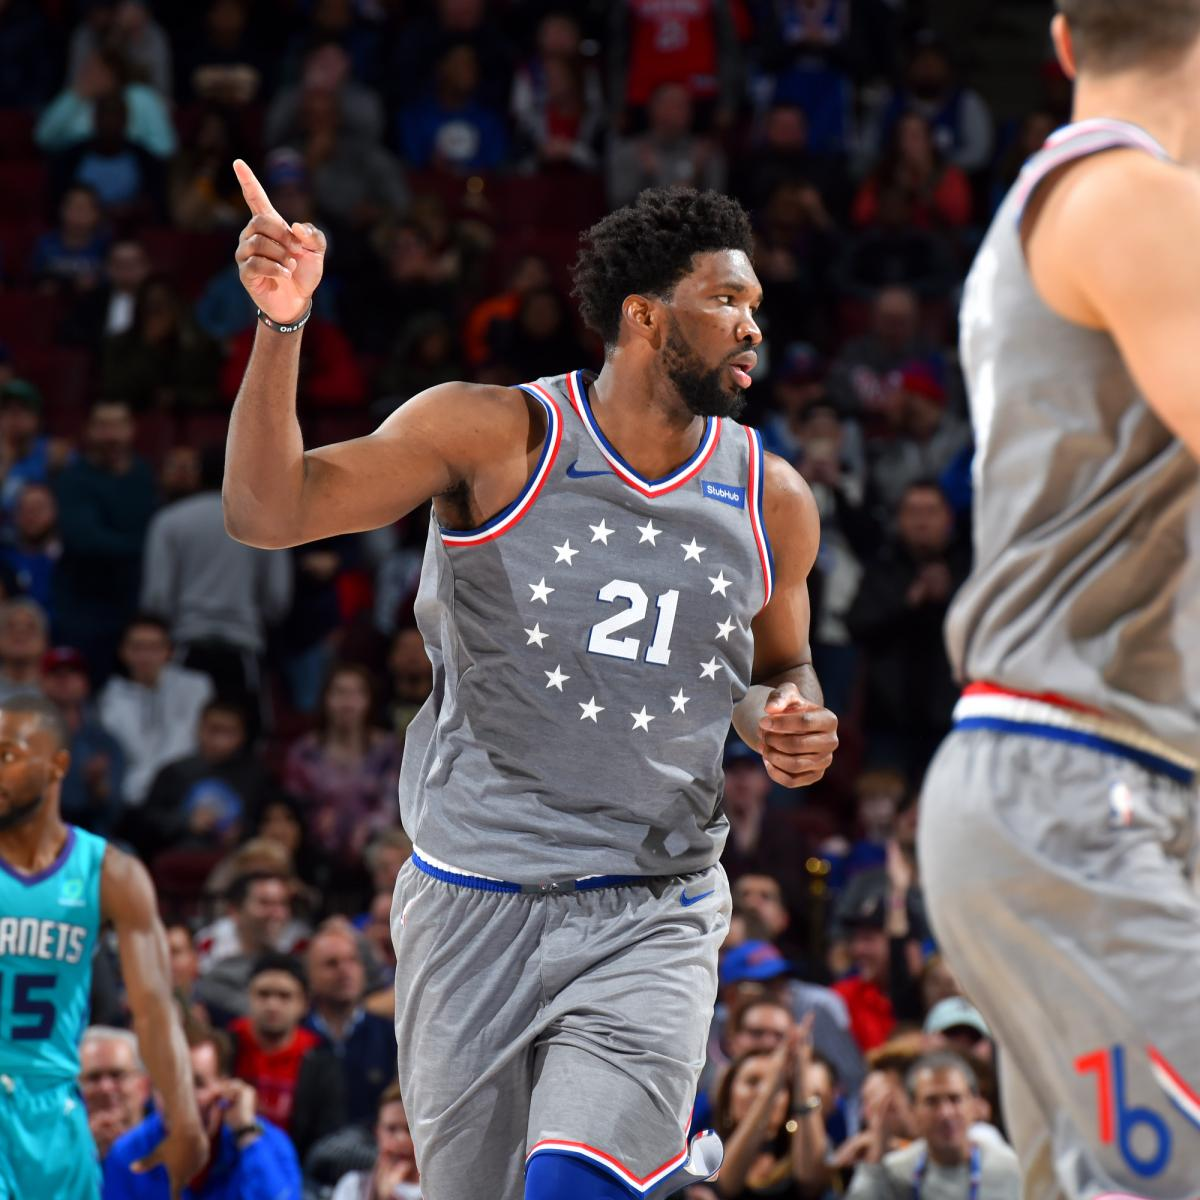 Joel Embiid Drops 42 Points, Snags 18 Rebounds in 76ers' OT Win vs. Hornets